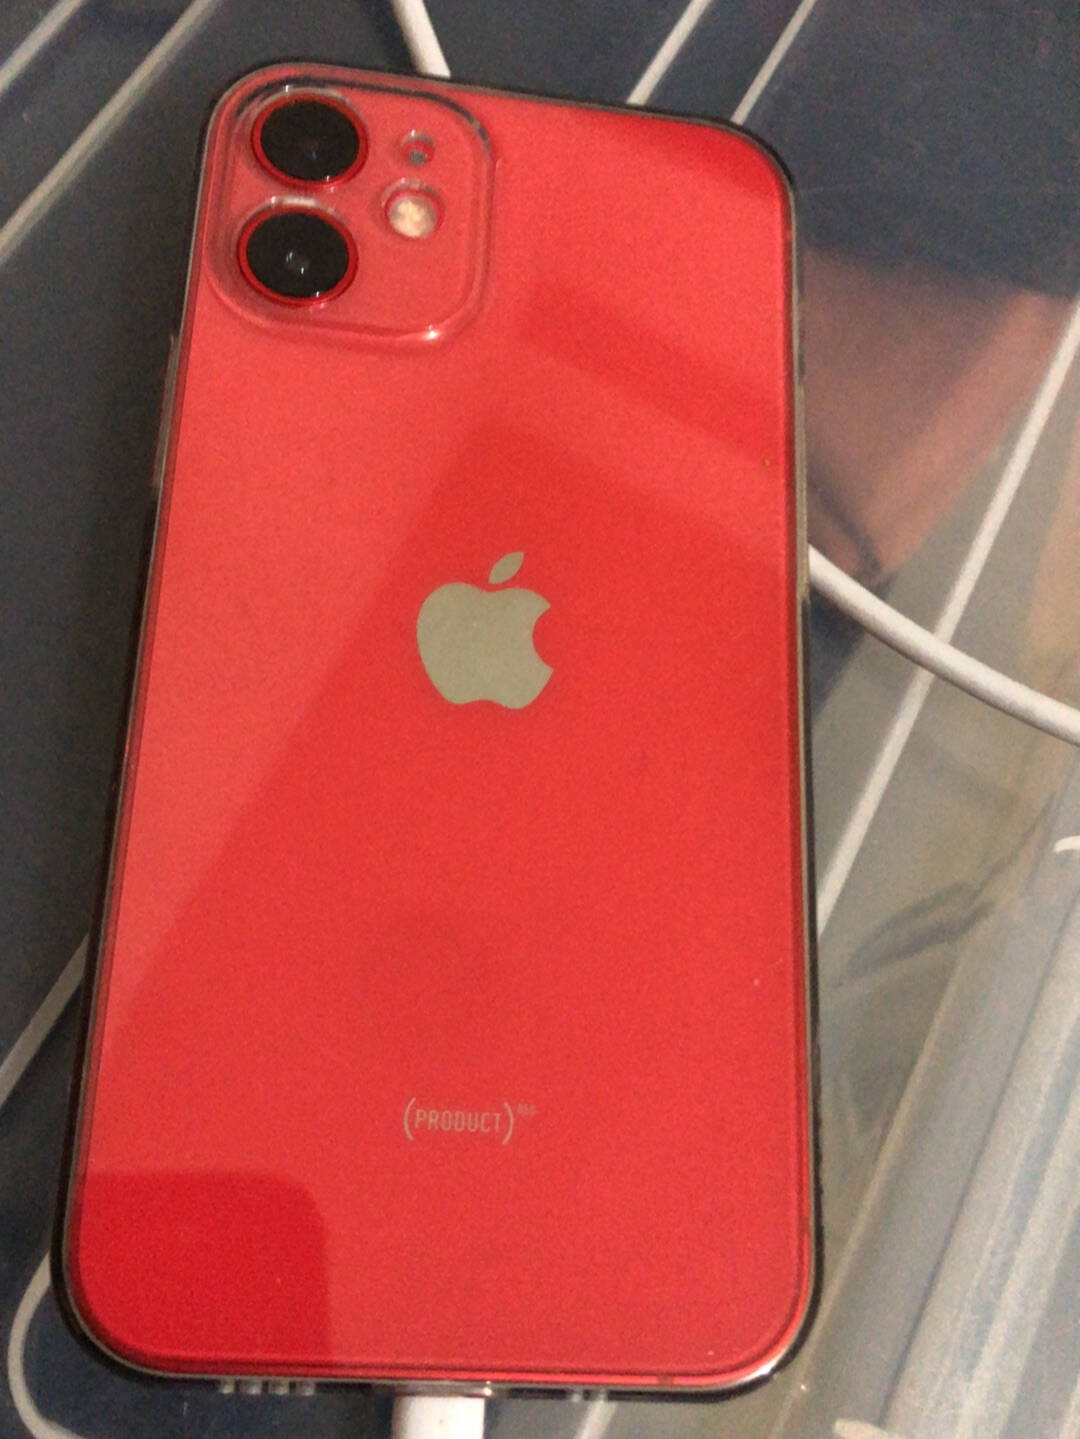 AppleiPhone12mini(A2400)128GB紫色手机支持移动联通电信5G